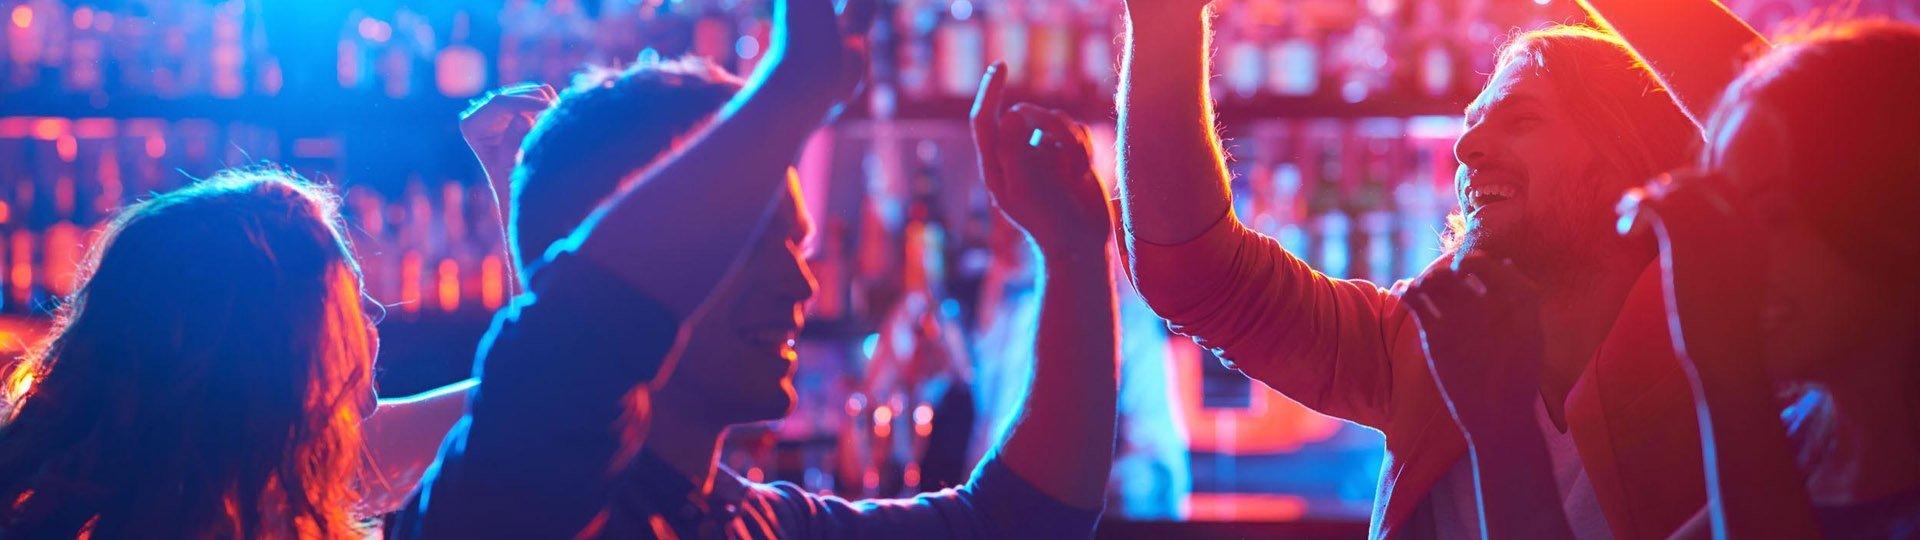 Ночной клуб Night Club El Niño